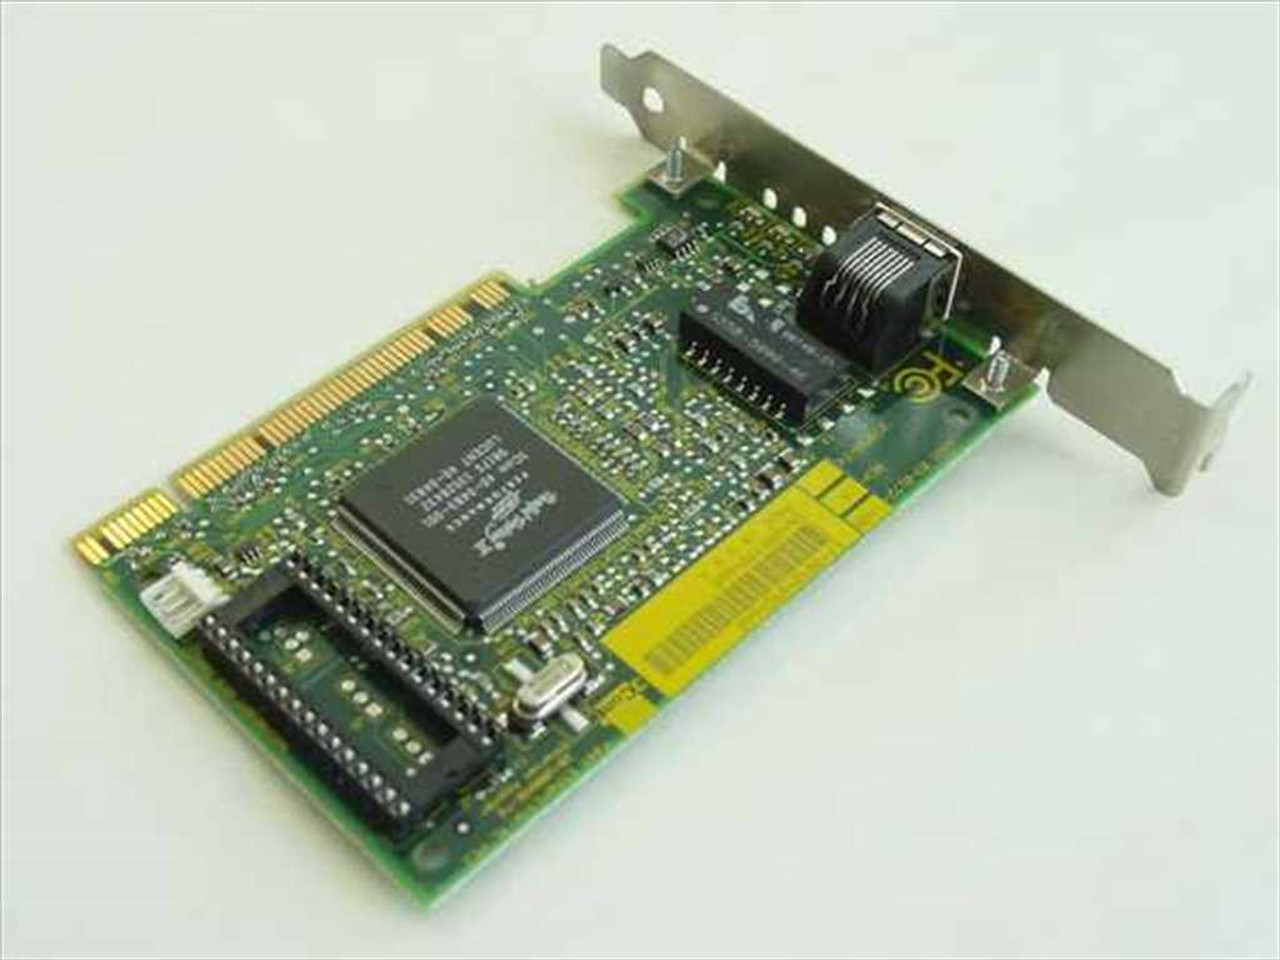 DRIVERS 3COM FAST ETHERLINK XL PCI 3C905B-TX